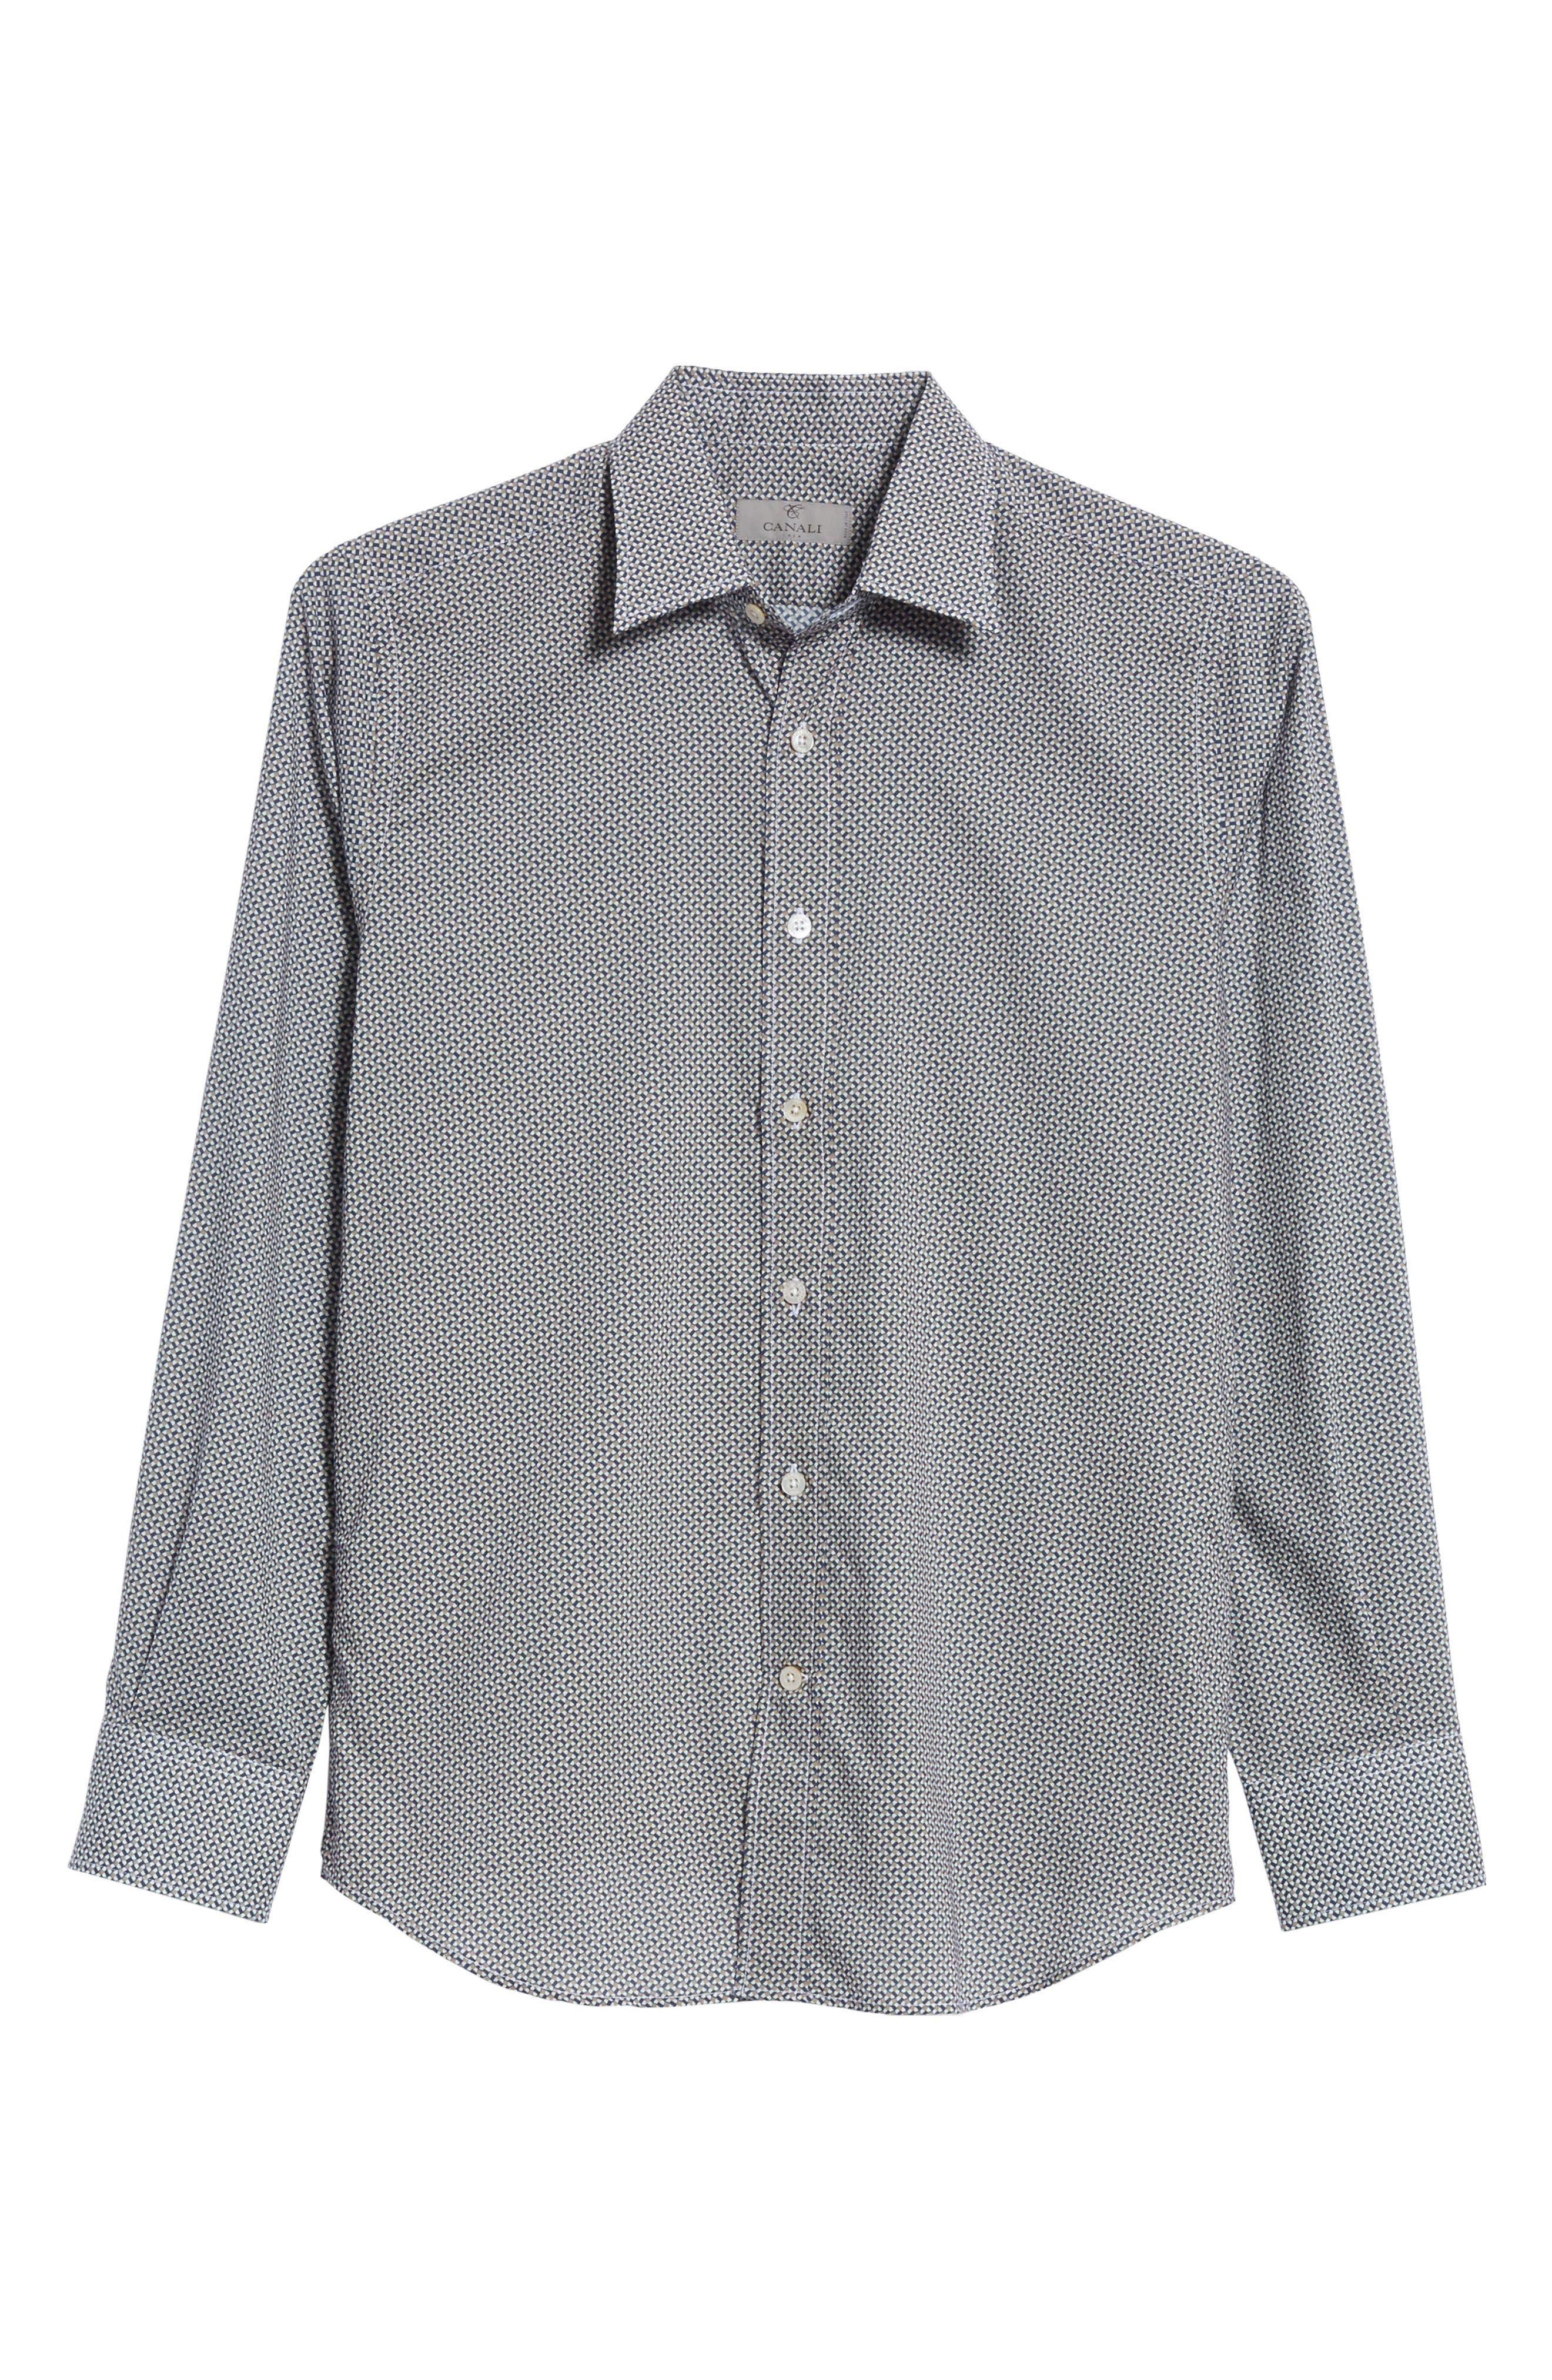 Regular Fit Print Sport Shirt,                             Alternate thumbnail 6, color,                             Dark Beige